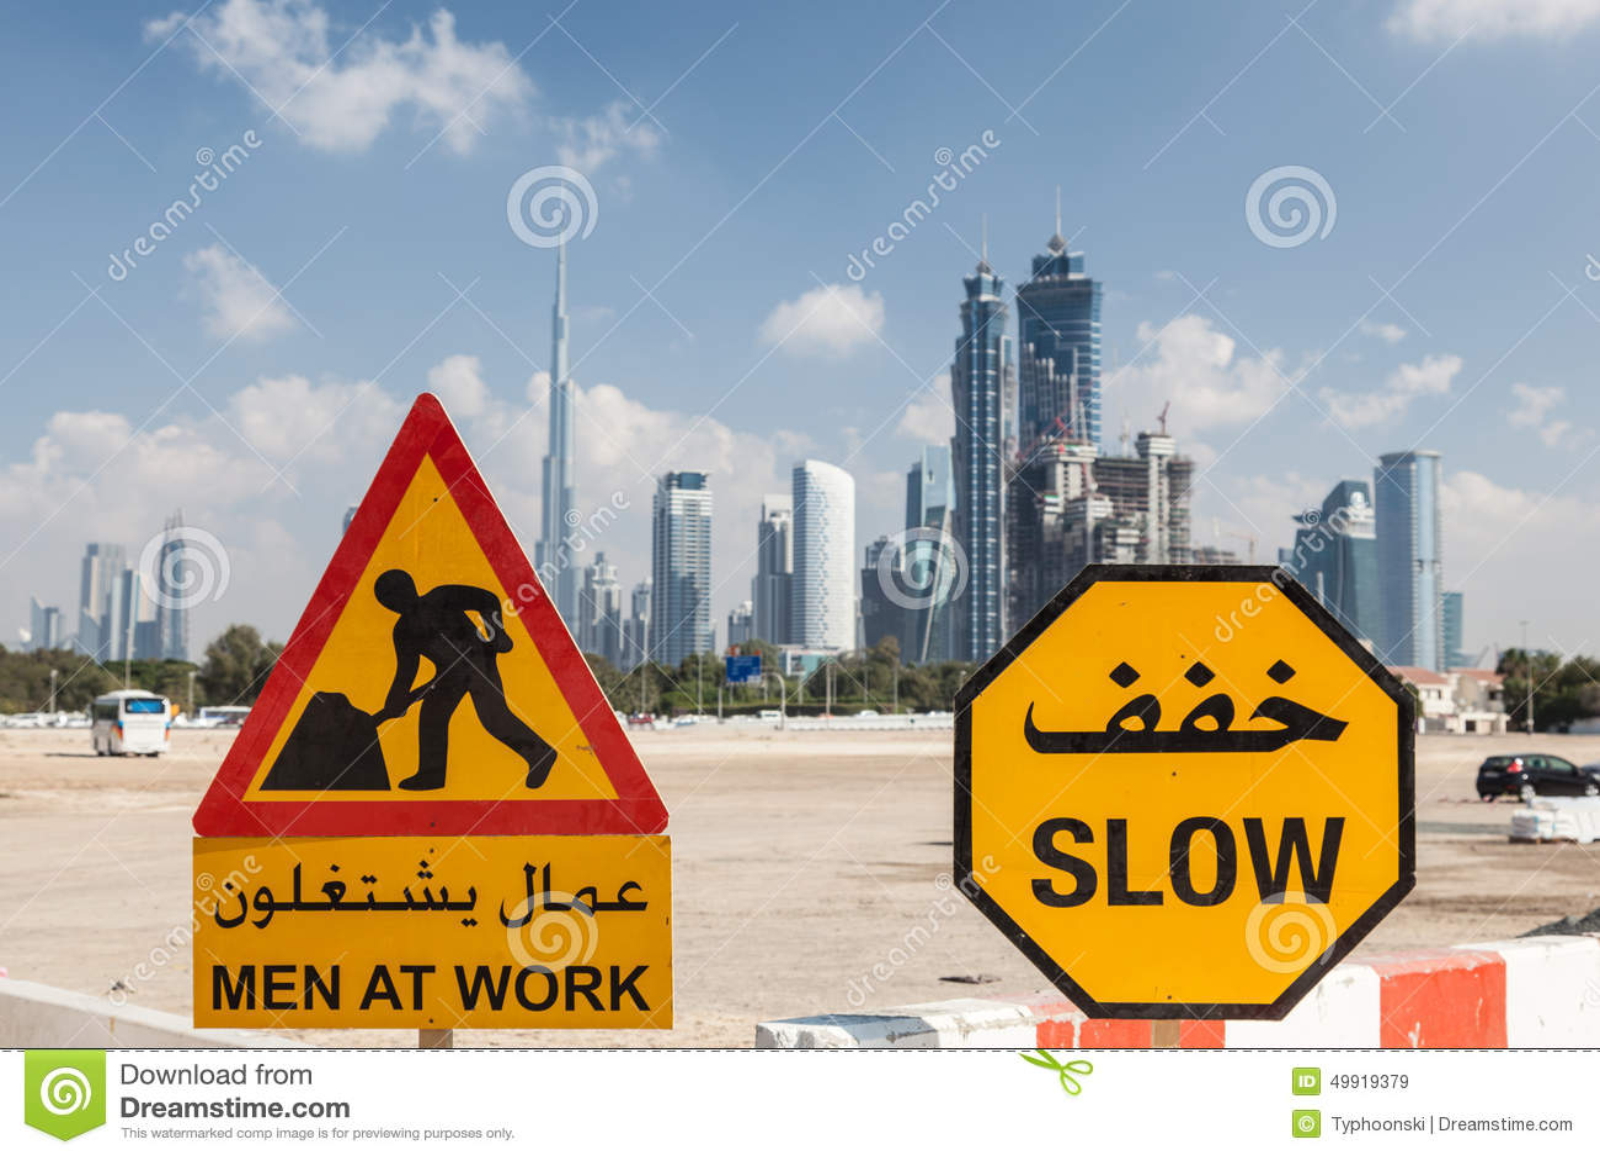 men at work sign in dubai stock photo image 49919379 road signs clip art jpg road sign clip art free download